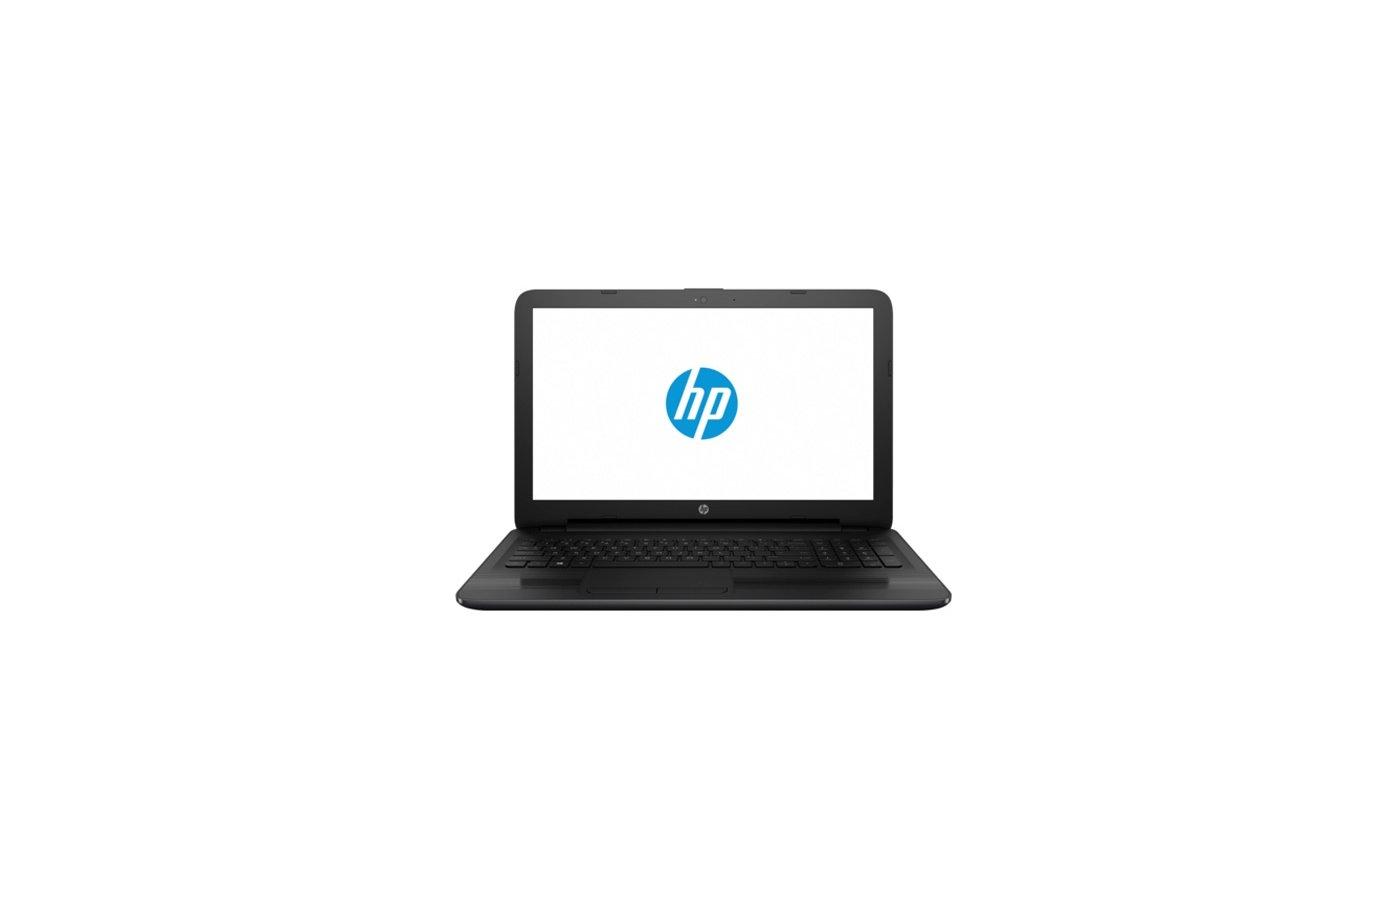 Ноутбук HP 250 G5 /W4N50EA/ intel N3060/4Gb/SSD128Gb/DVDRW/Intel HD/15.6/WiFi/Win10